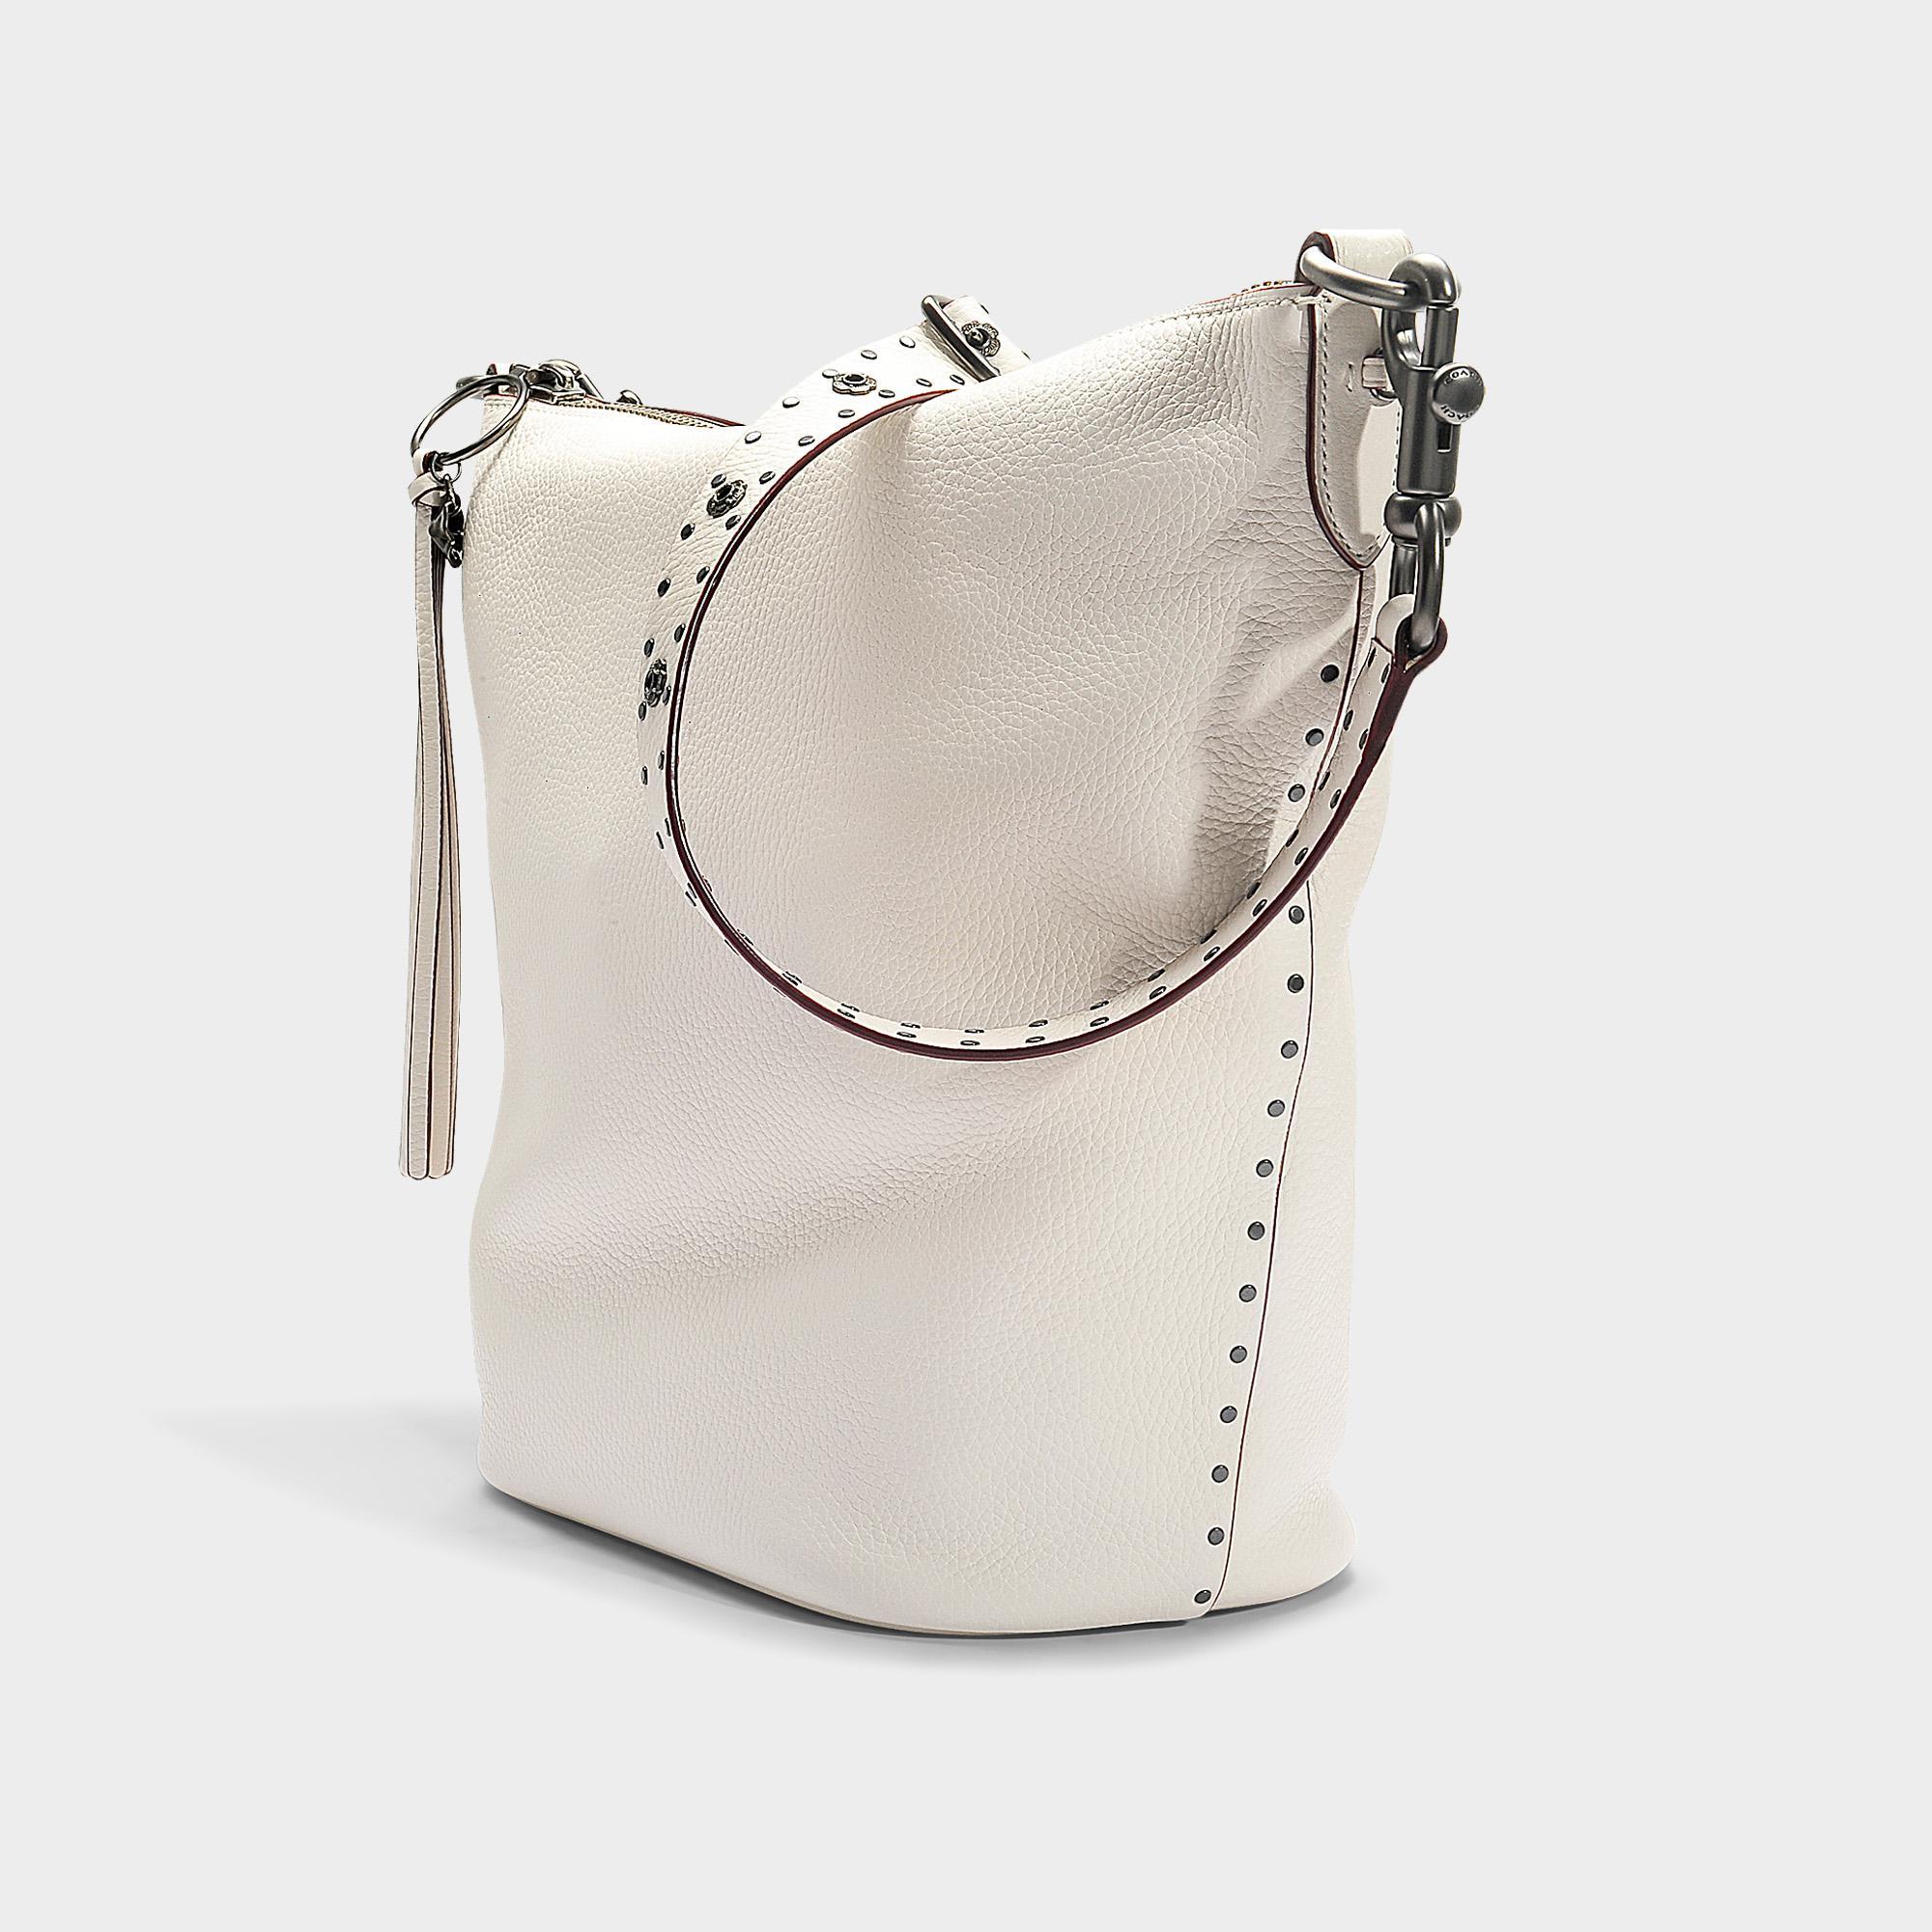 76155c31642d1 Lyst - COACH Border Rivets Duffle Bag In Chalk Calfskin in White